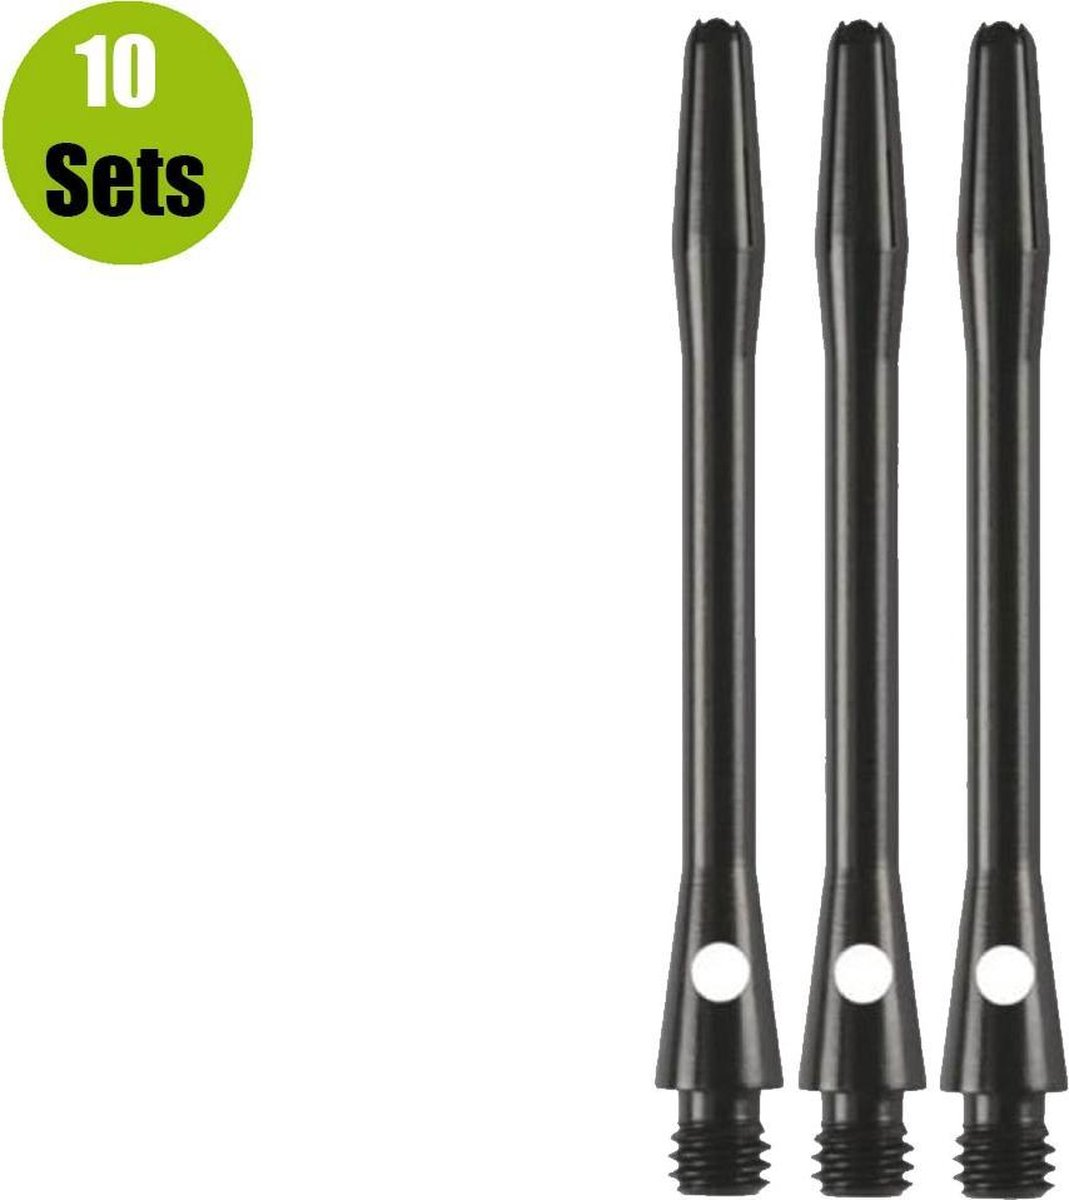 Aluminium Dart Shafts - Zwart - Short - (10 Sets)